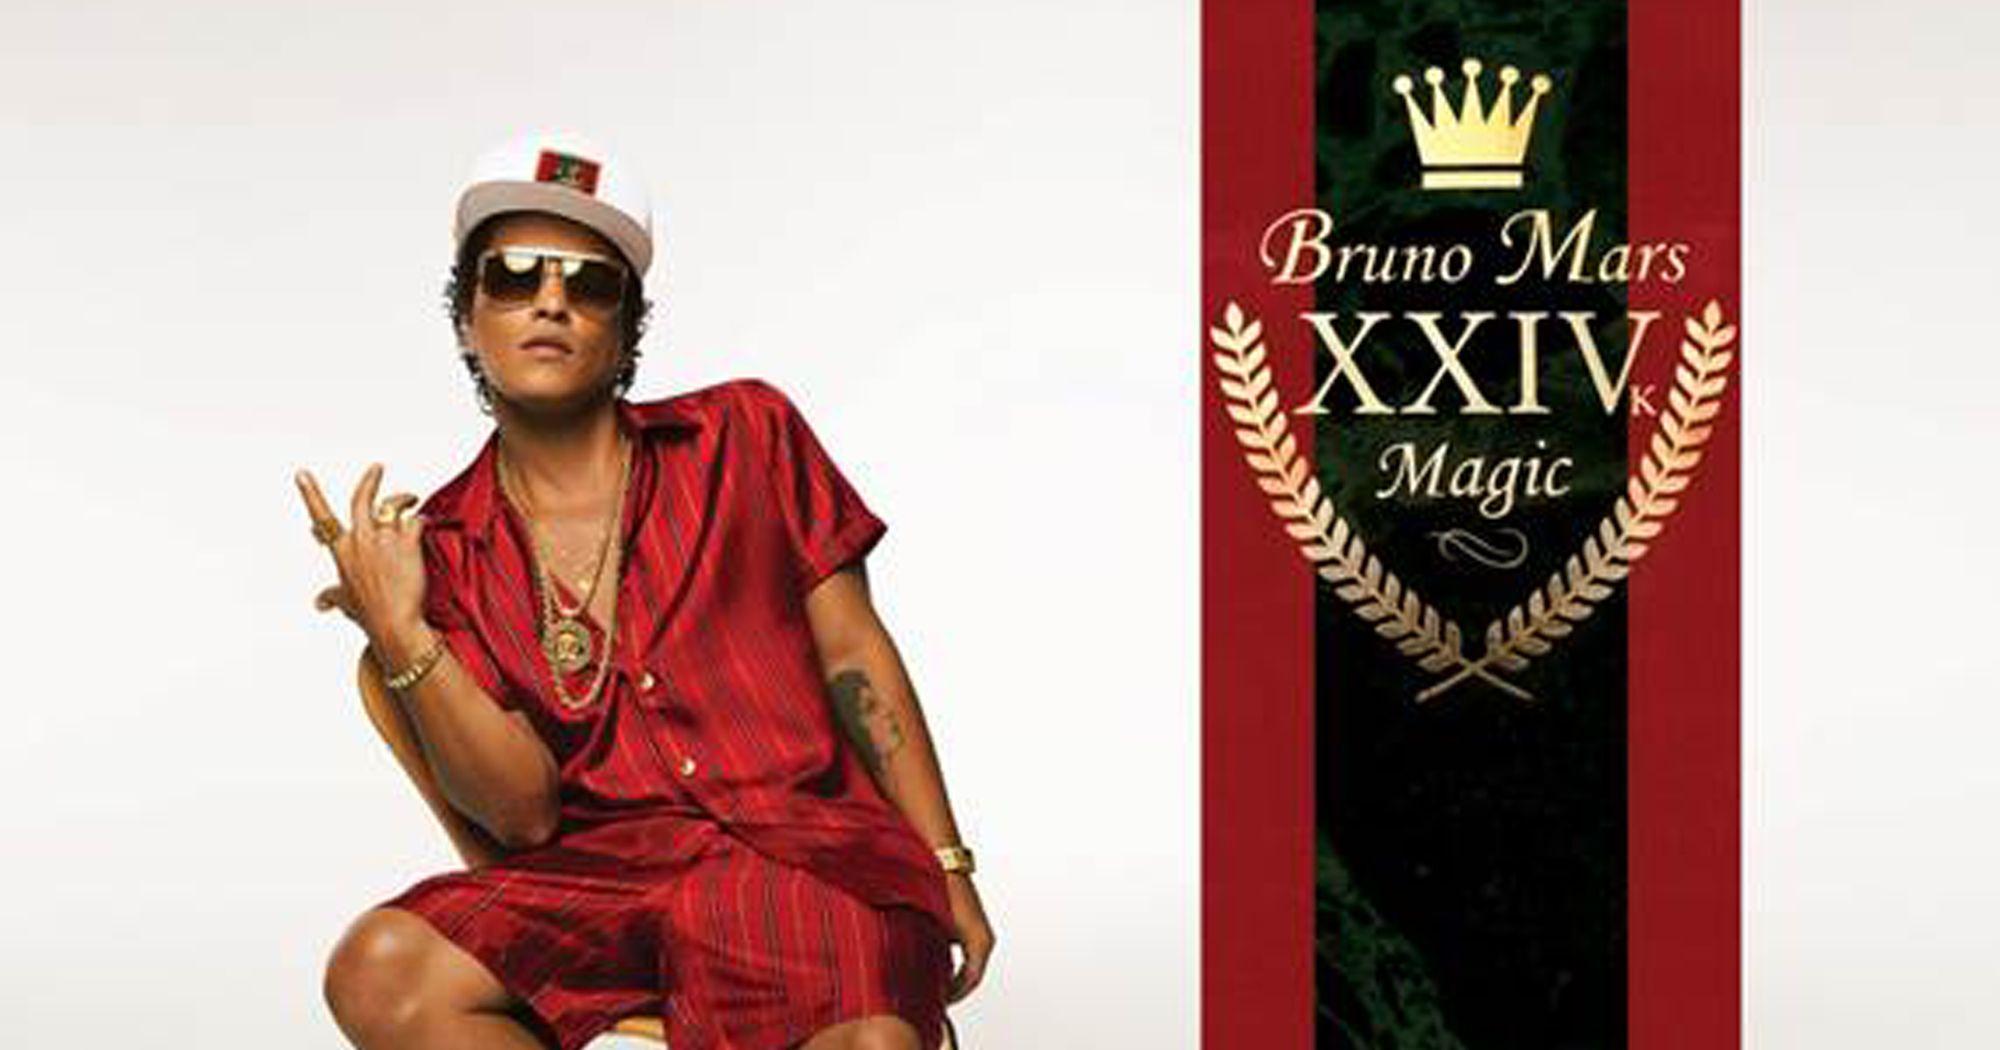 Presale Codes For Bruno Mars Tour